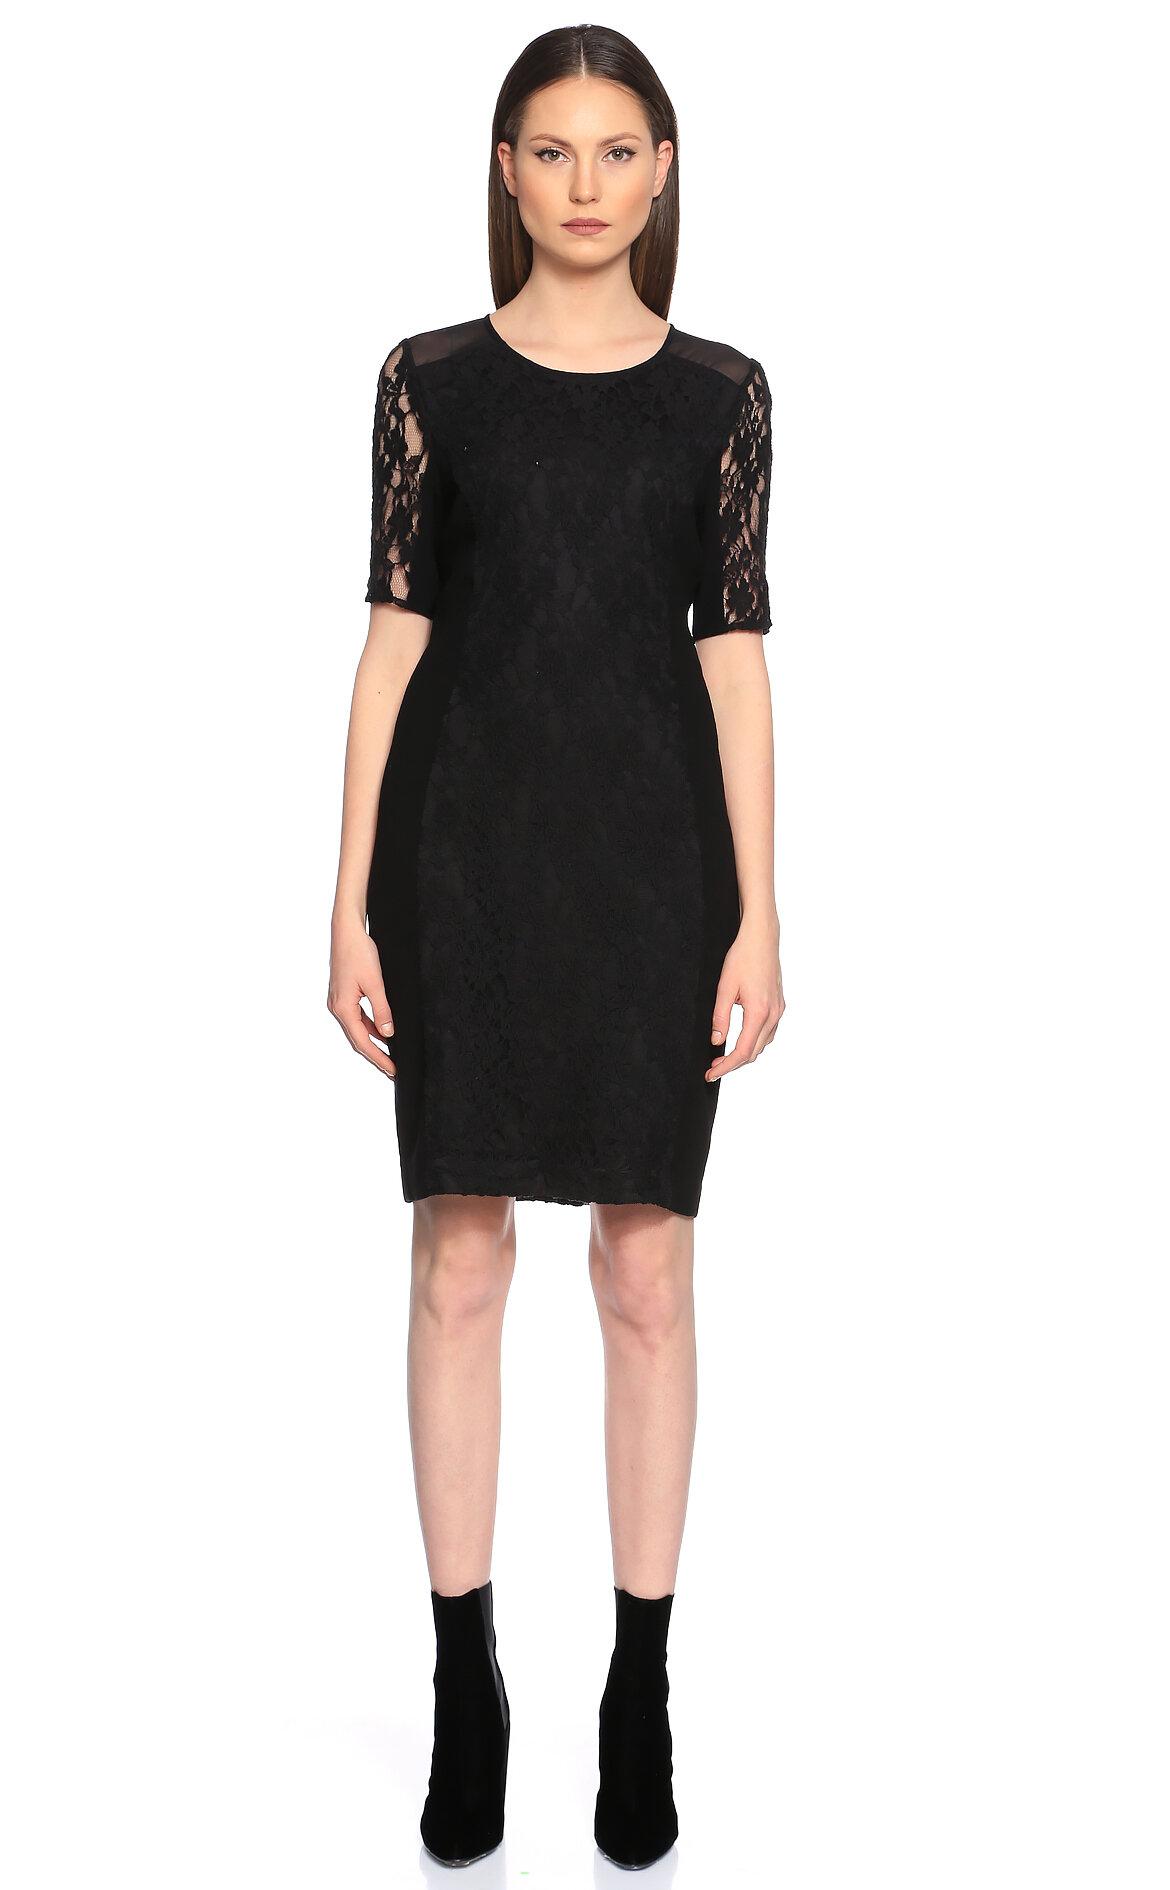 DKNY Dantel Detaylı Siyah Elbise